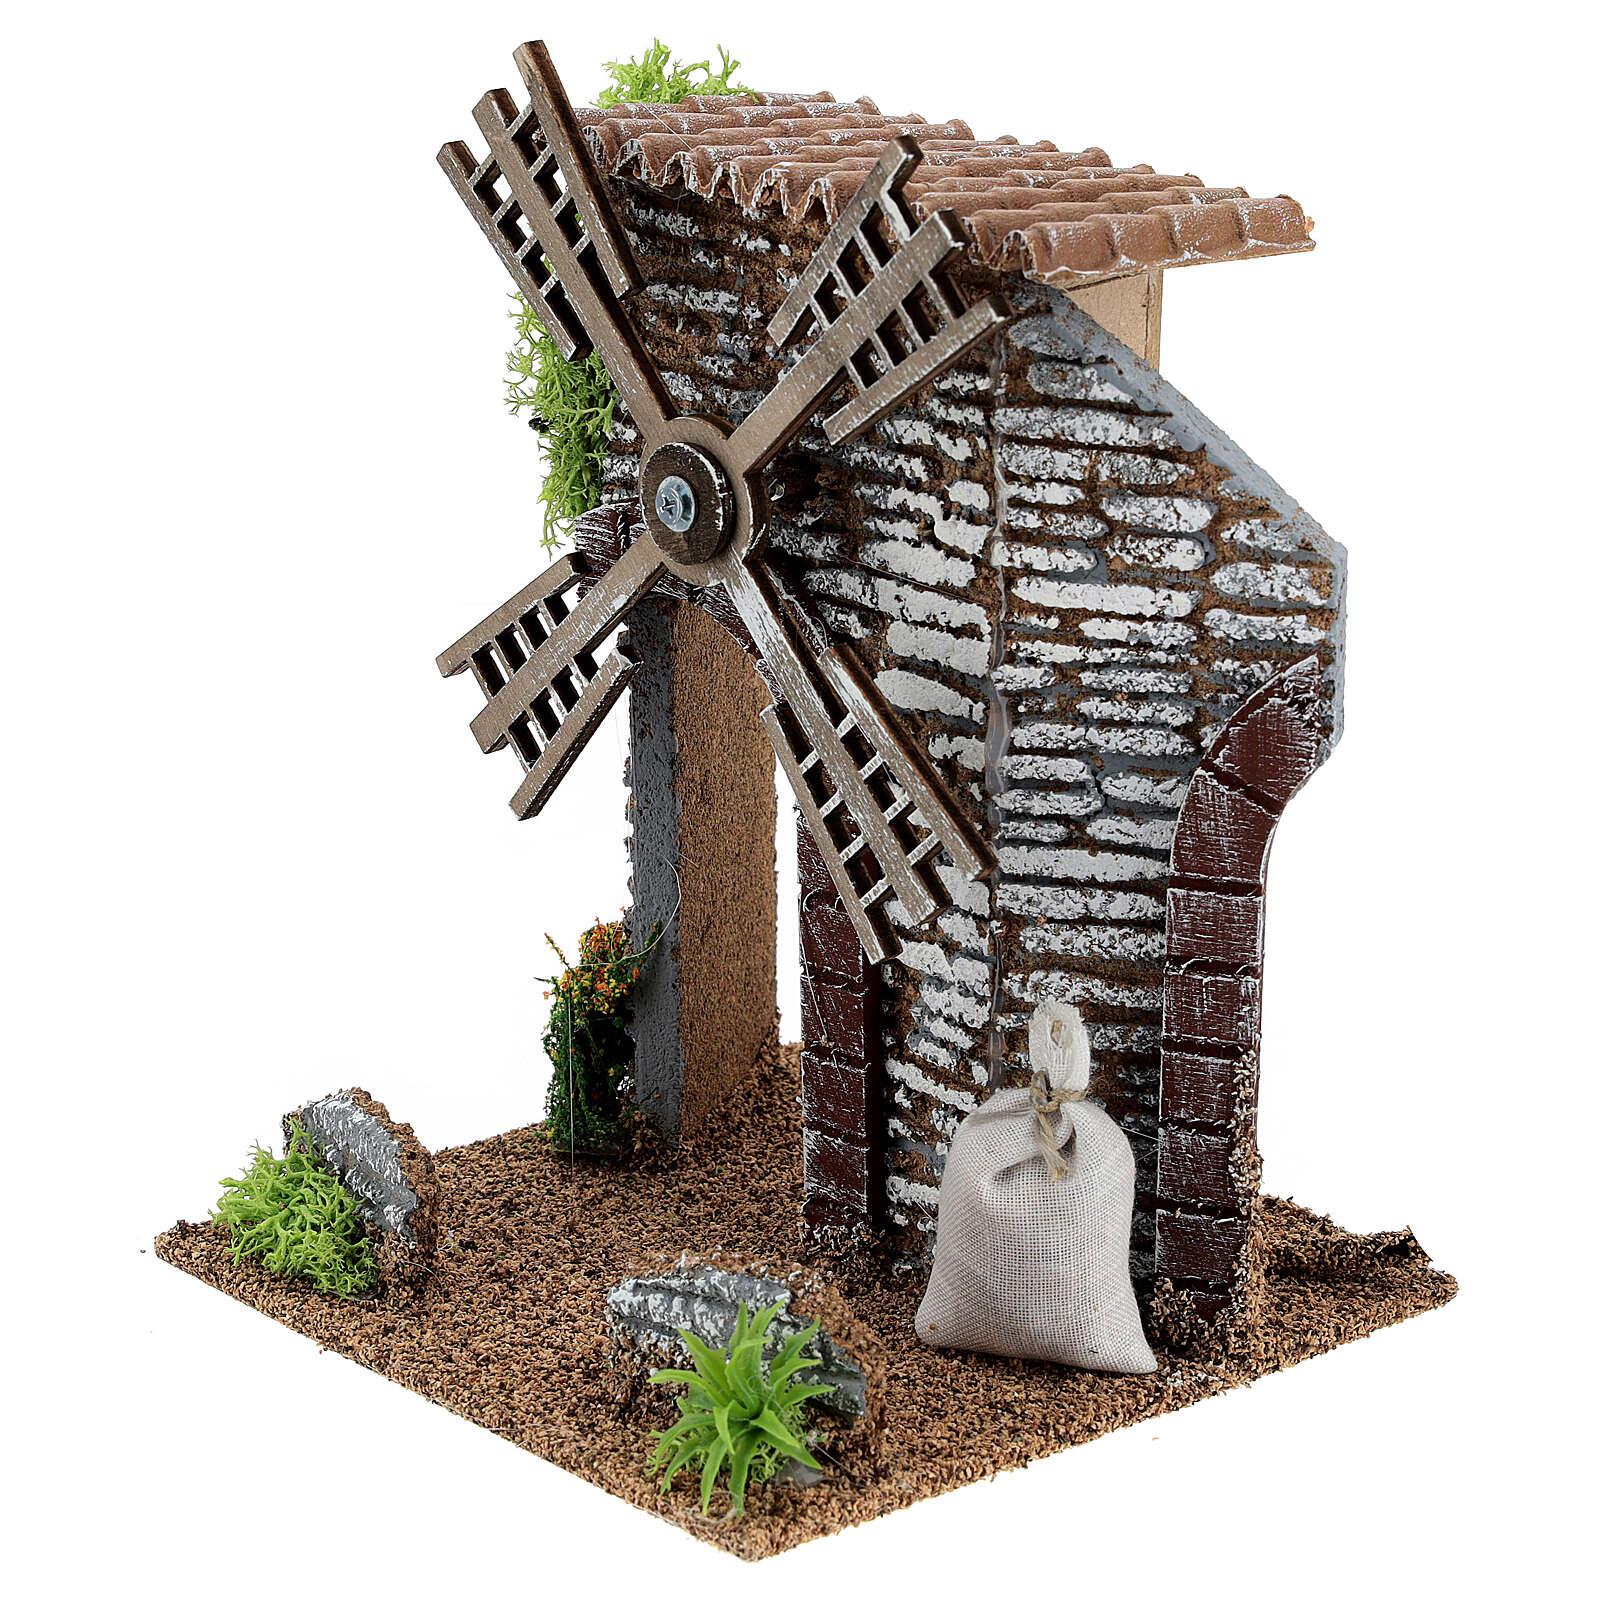 Working windmill cottage 20x14x14 cm nativity scenes 6-8 cm 4